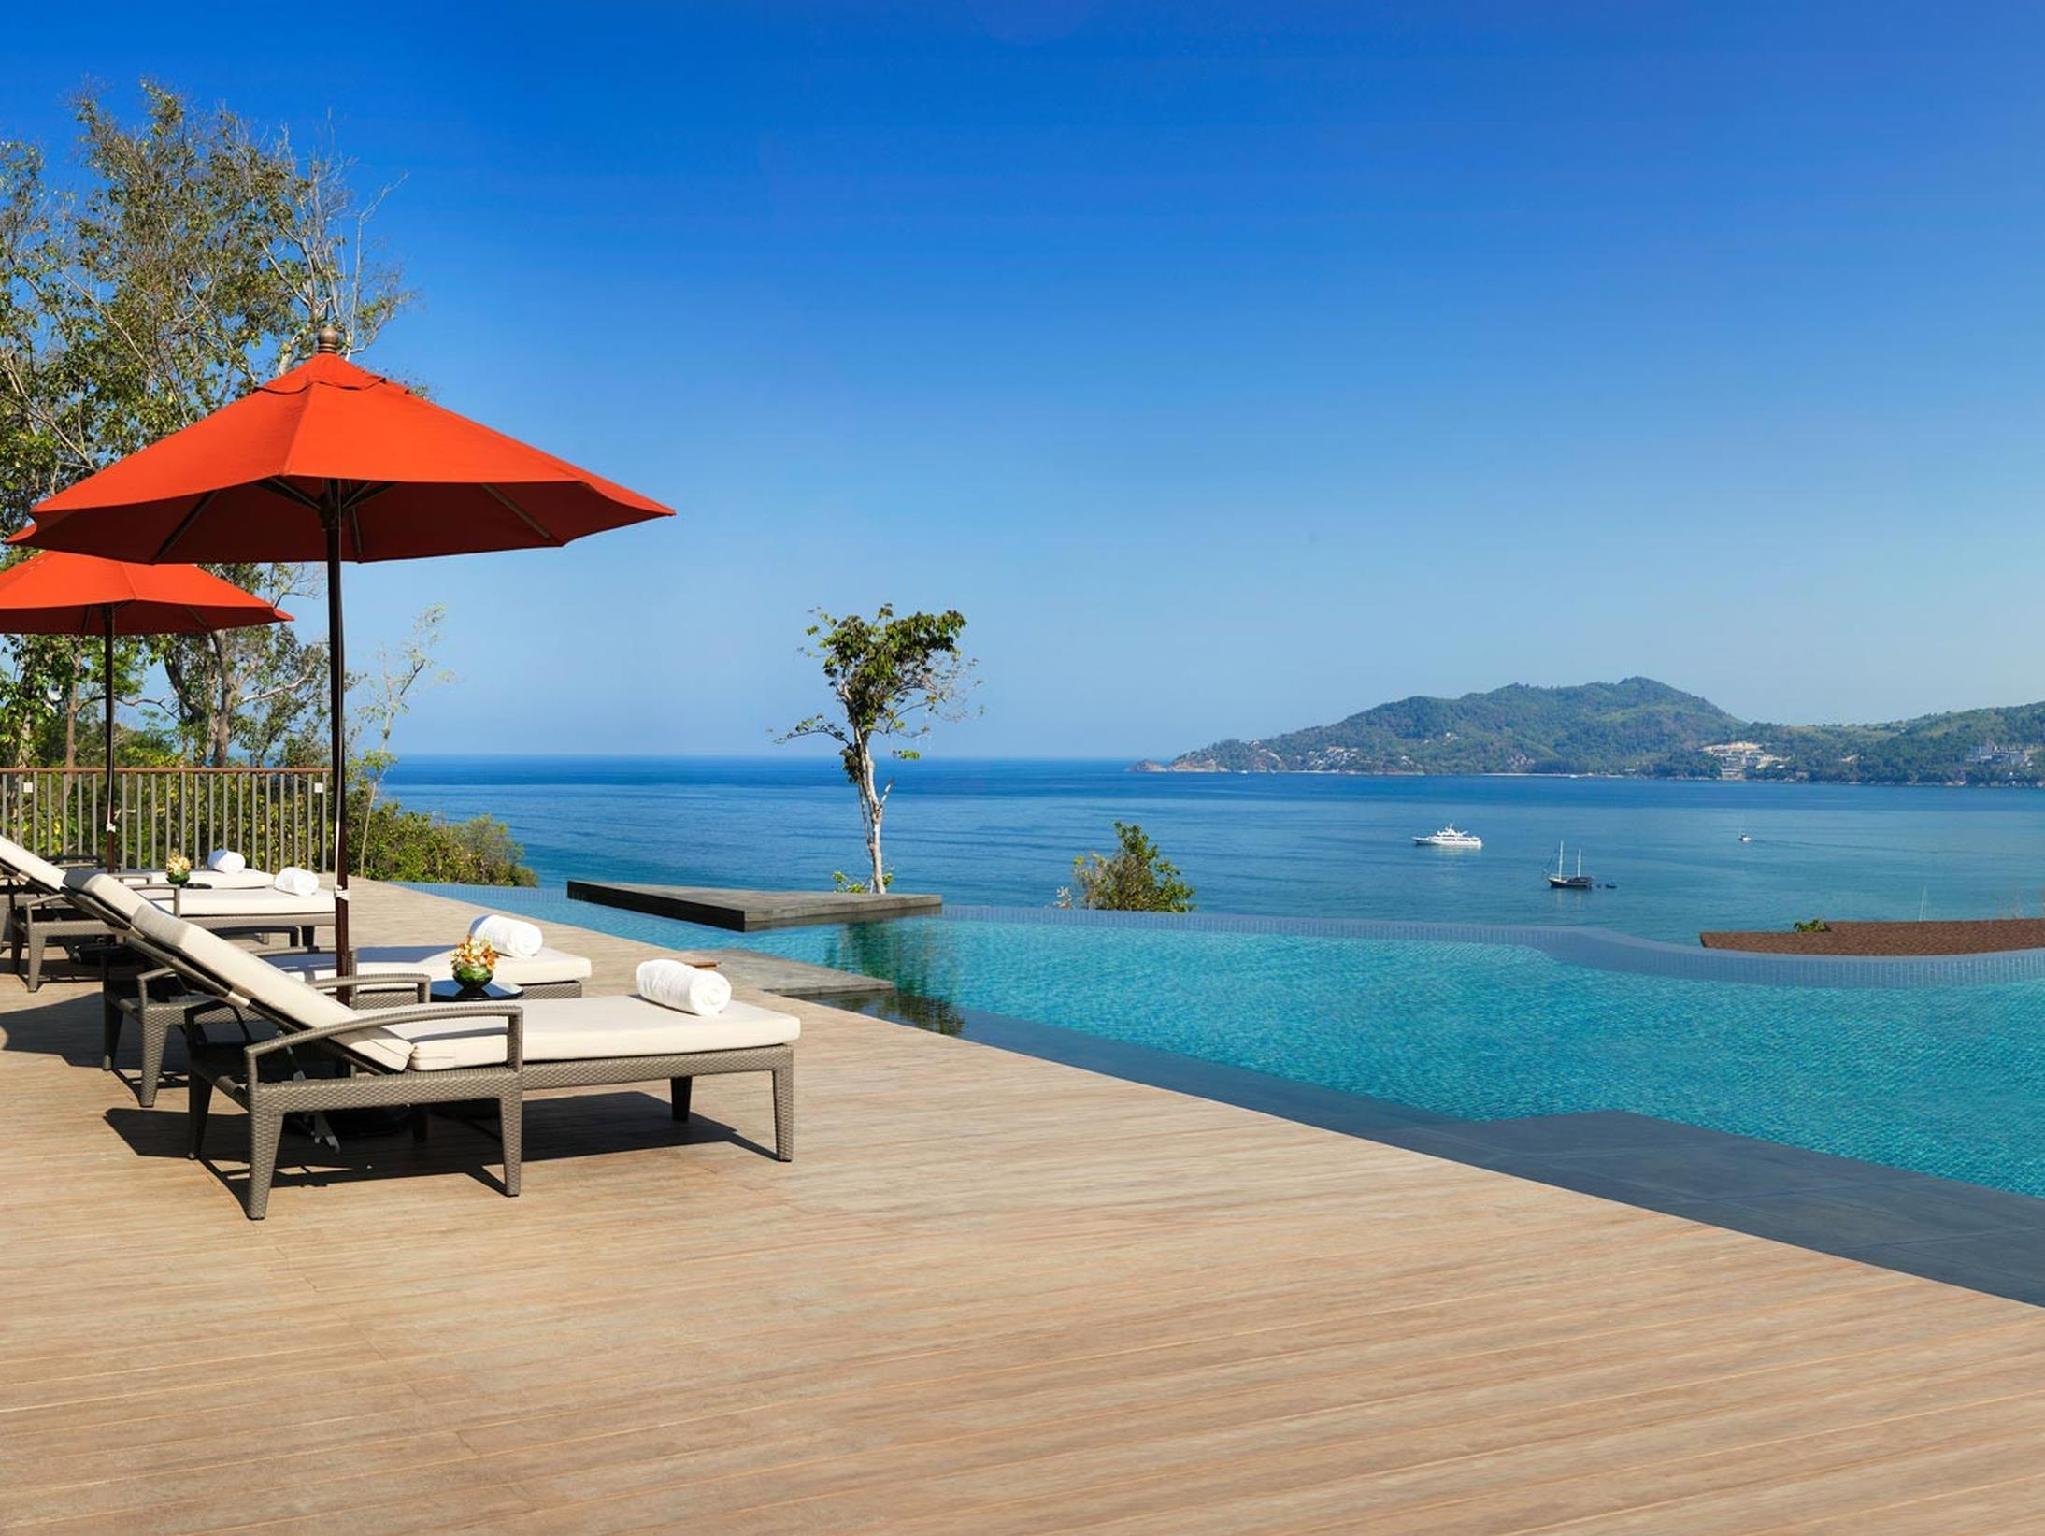 Amari Phuket - Phuket